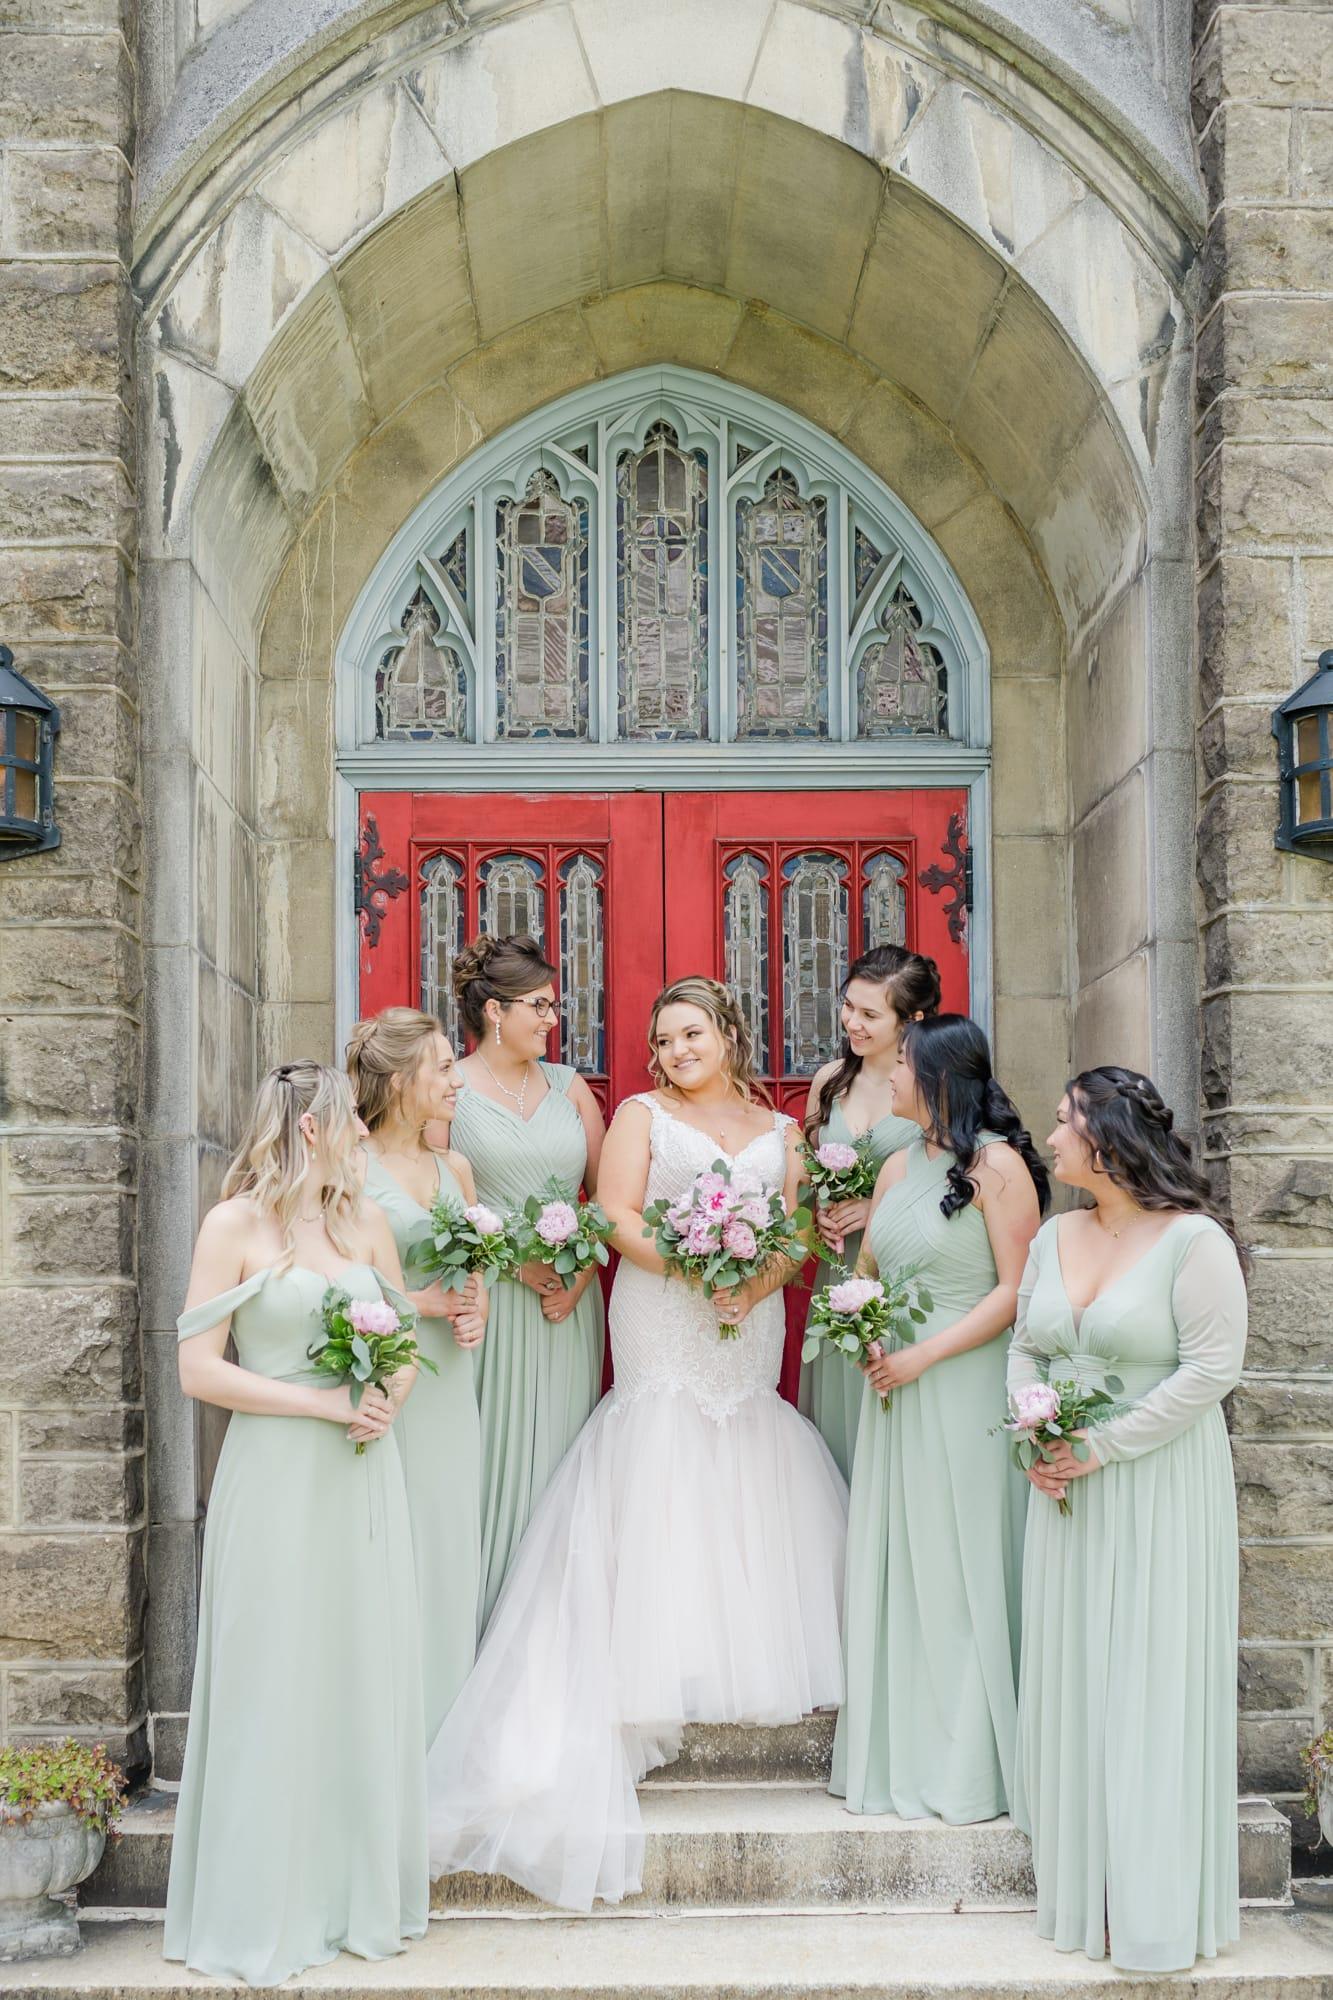 Central Pennsylvania PA summer wedding bridal party